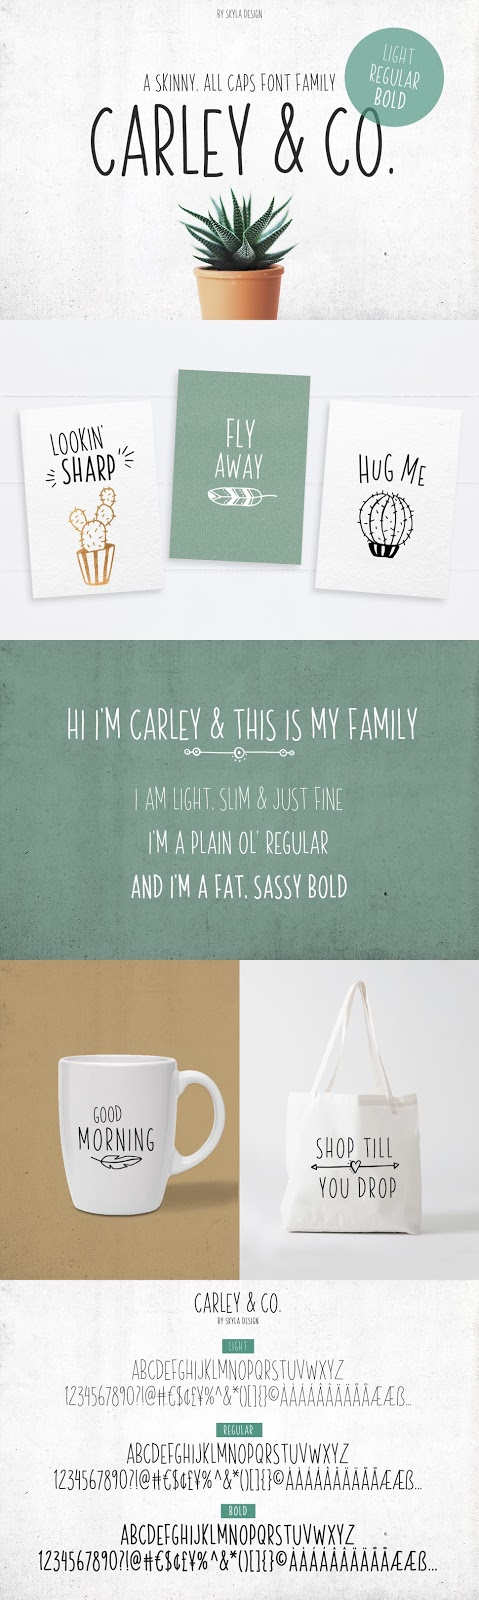 Carley & Co. font family Skyla Design